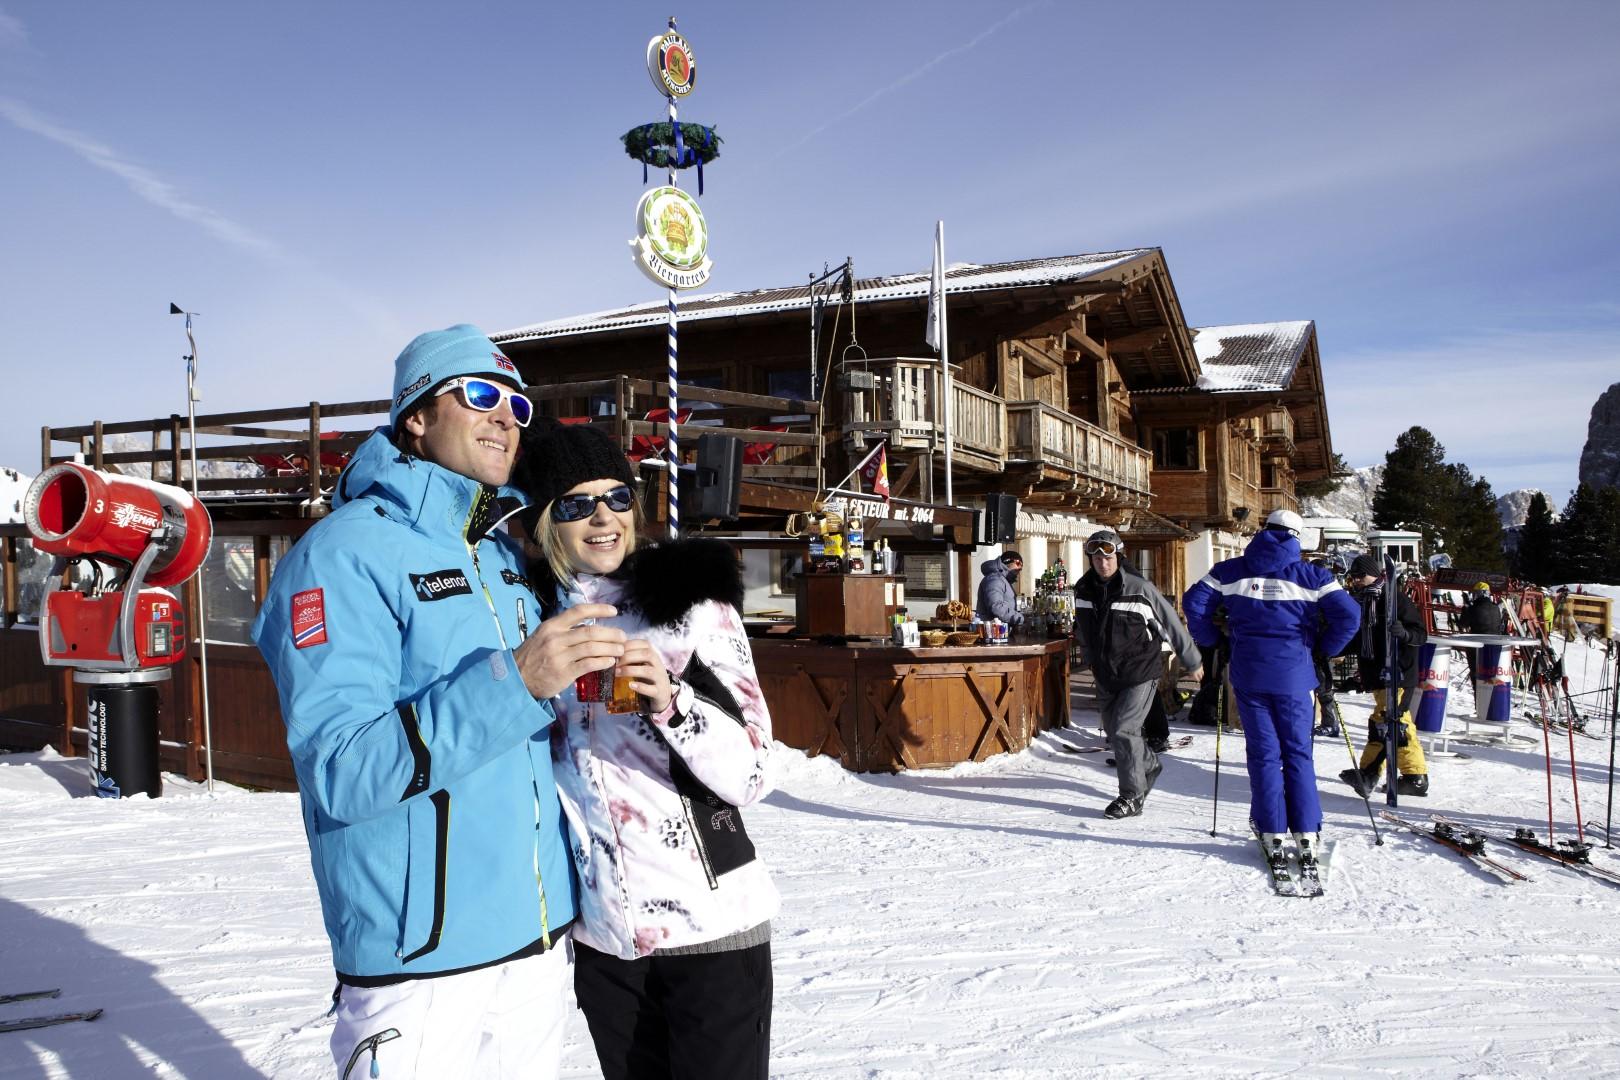 2011 Piz Seteur 025 - Après Ski